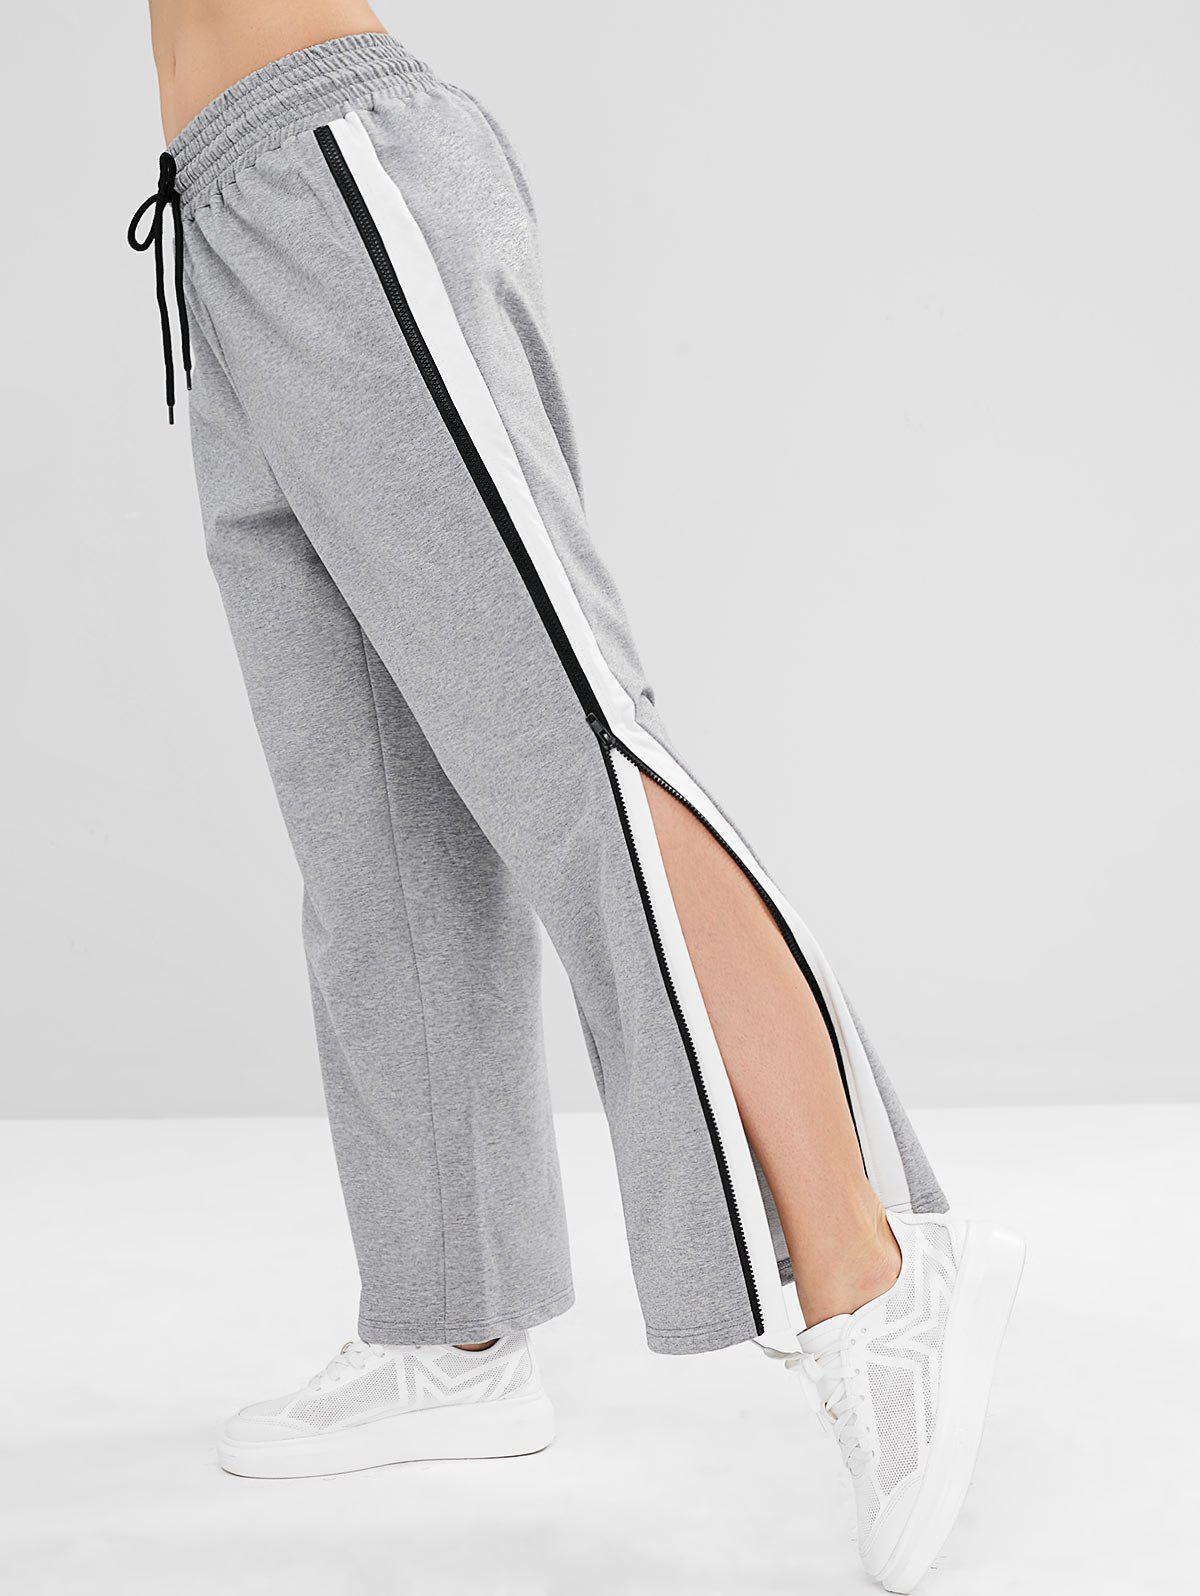 ZAFUL Striped Zipper Loose Pants thumbnail